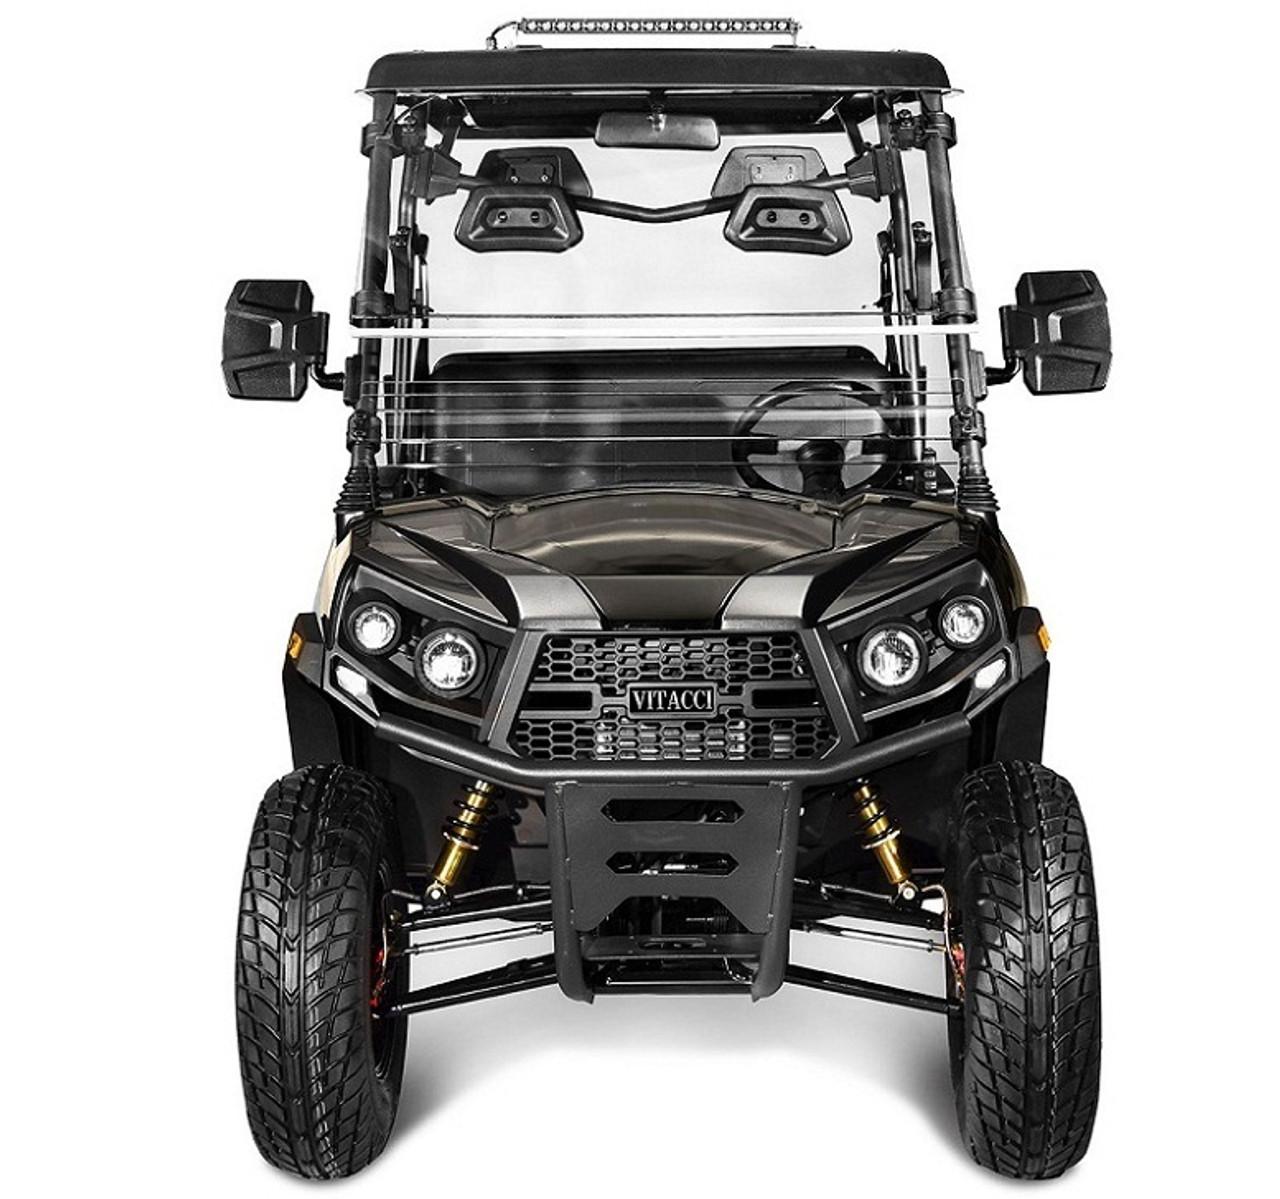 Black - Vitacci Rover-200 EFI 169cc (Golf Cart) UTV, 4-stroke, Single-cylinder, Oil-cooled